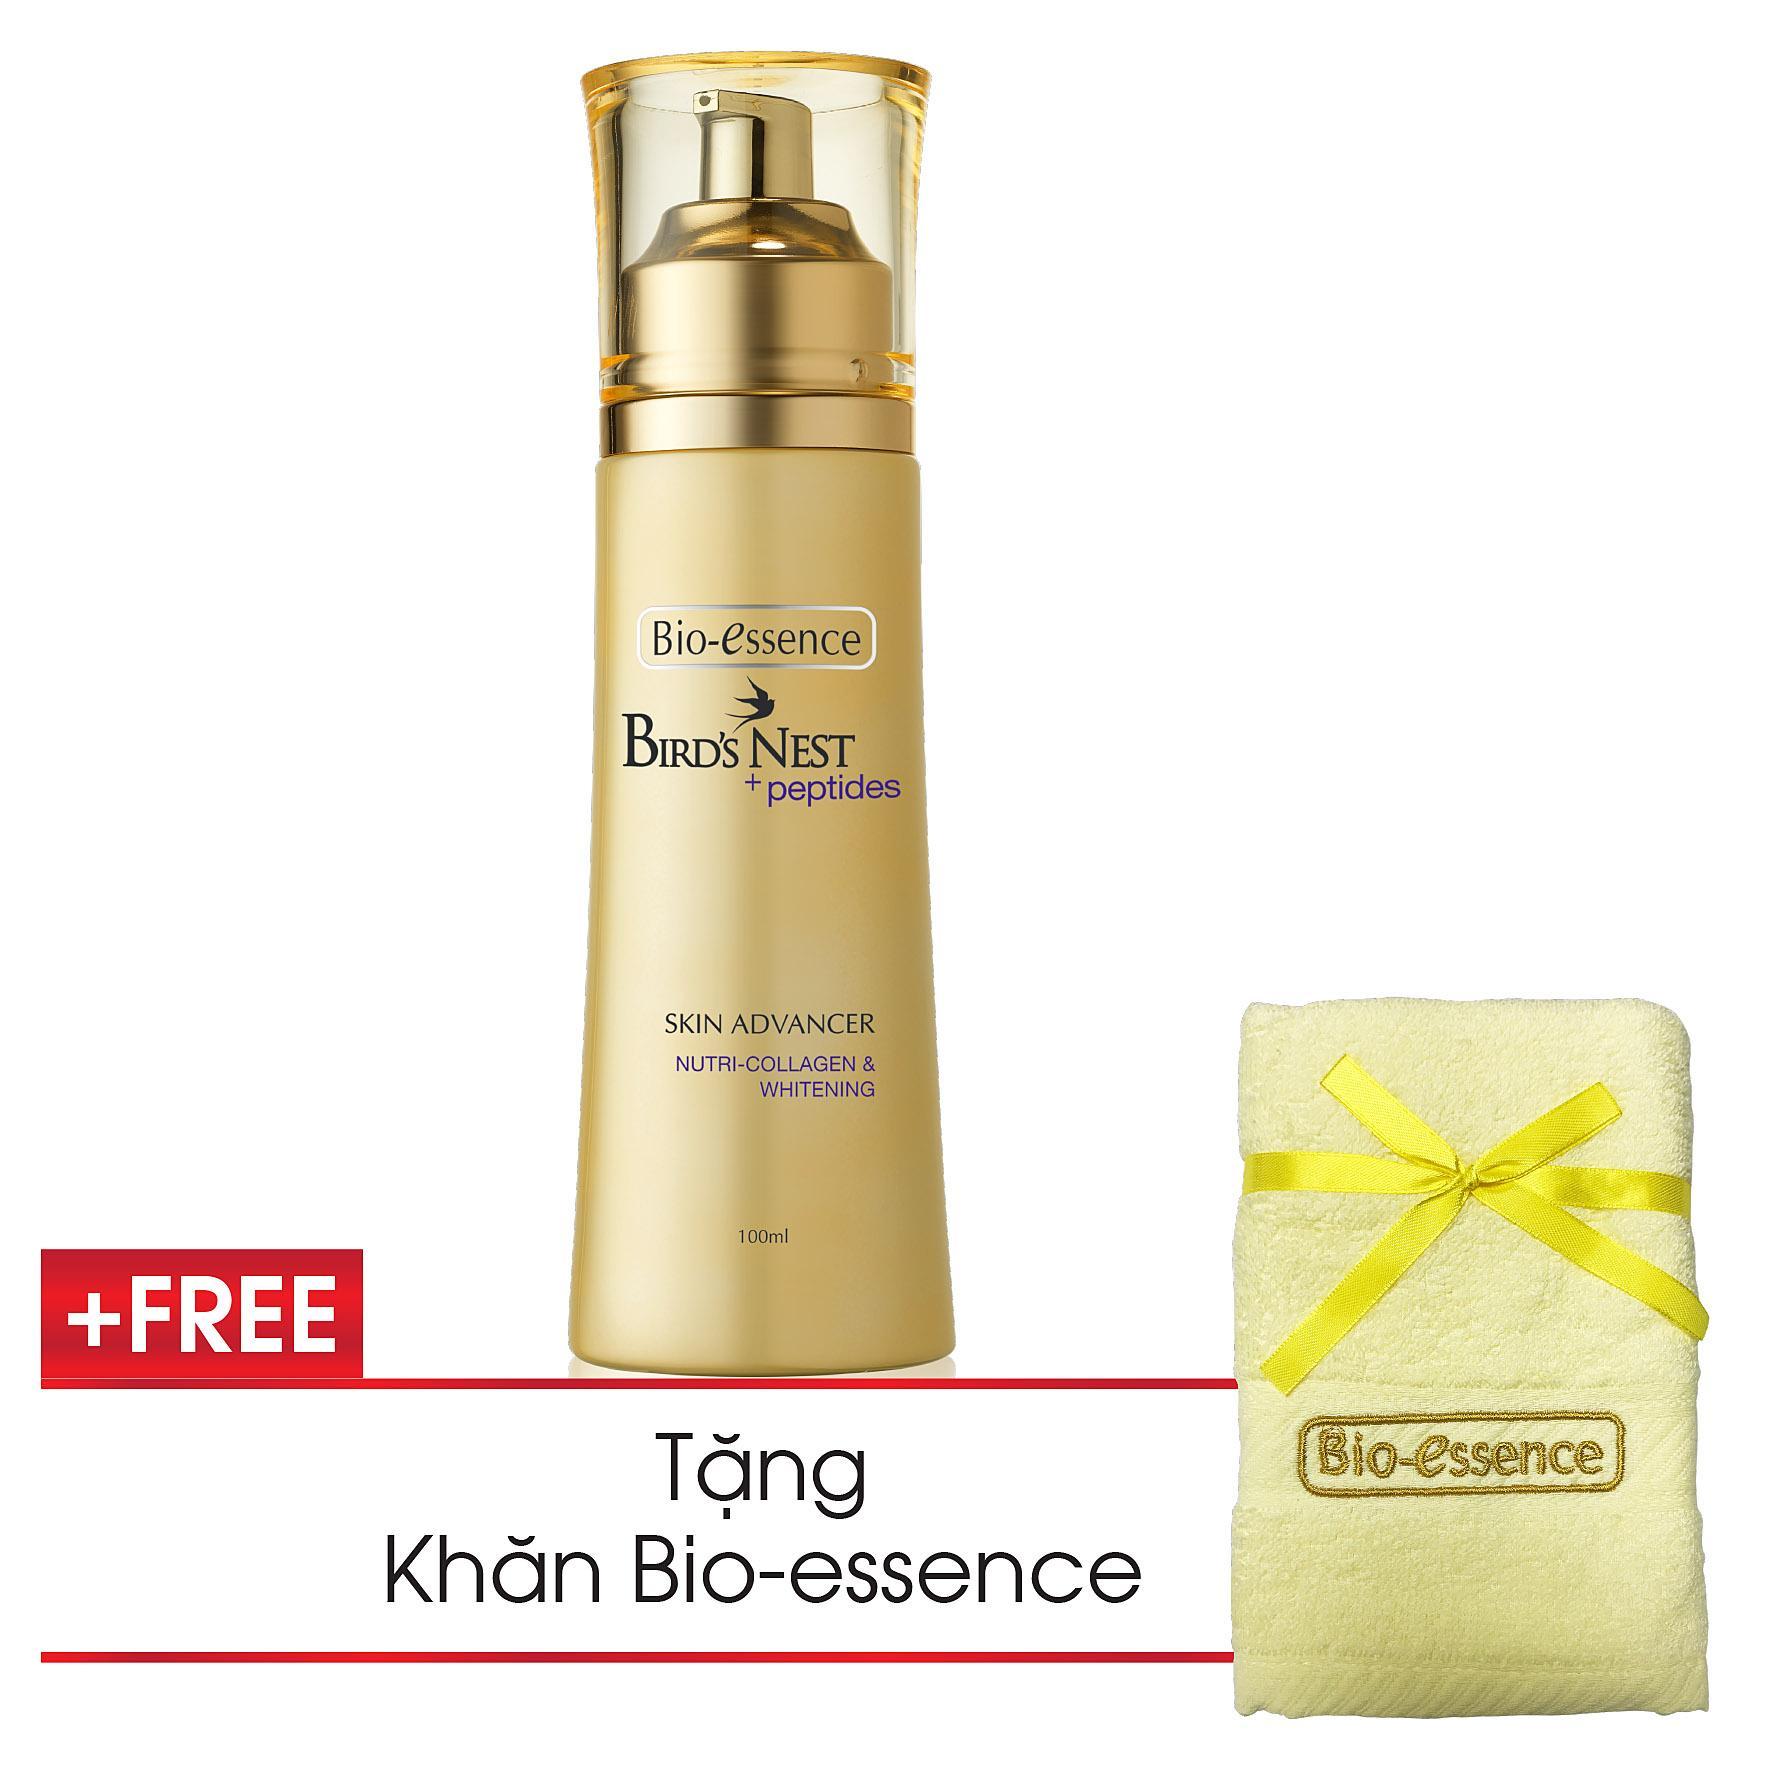 Nc Cn Bng Dng Trng Tinh Cht T Yn Peptides Bio Essence Bird Nest Skin Advancer 100ml Lazada 850x850px 2